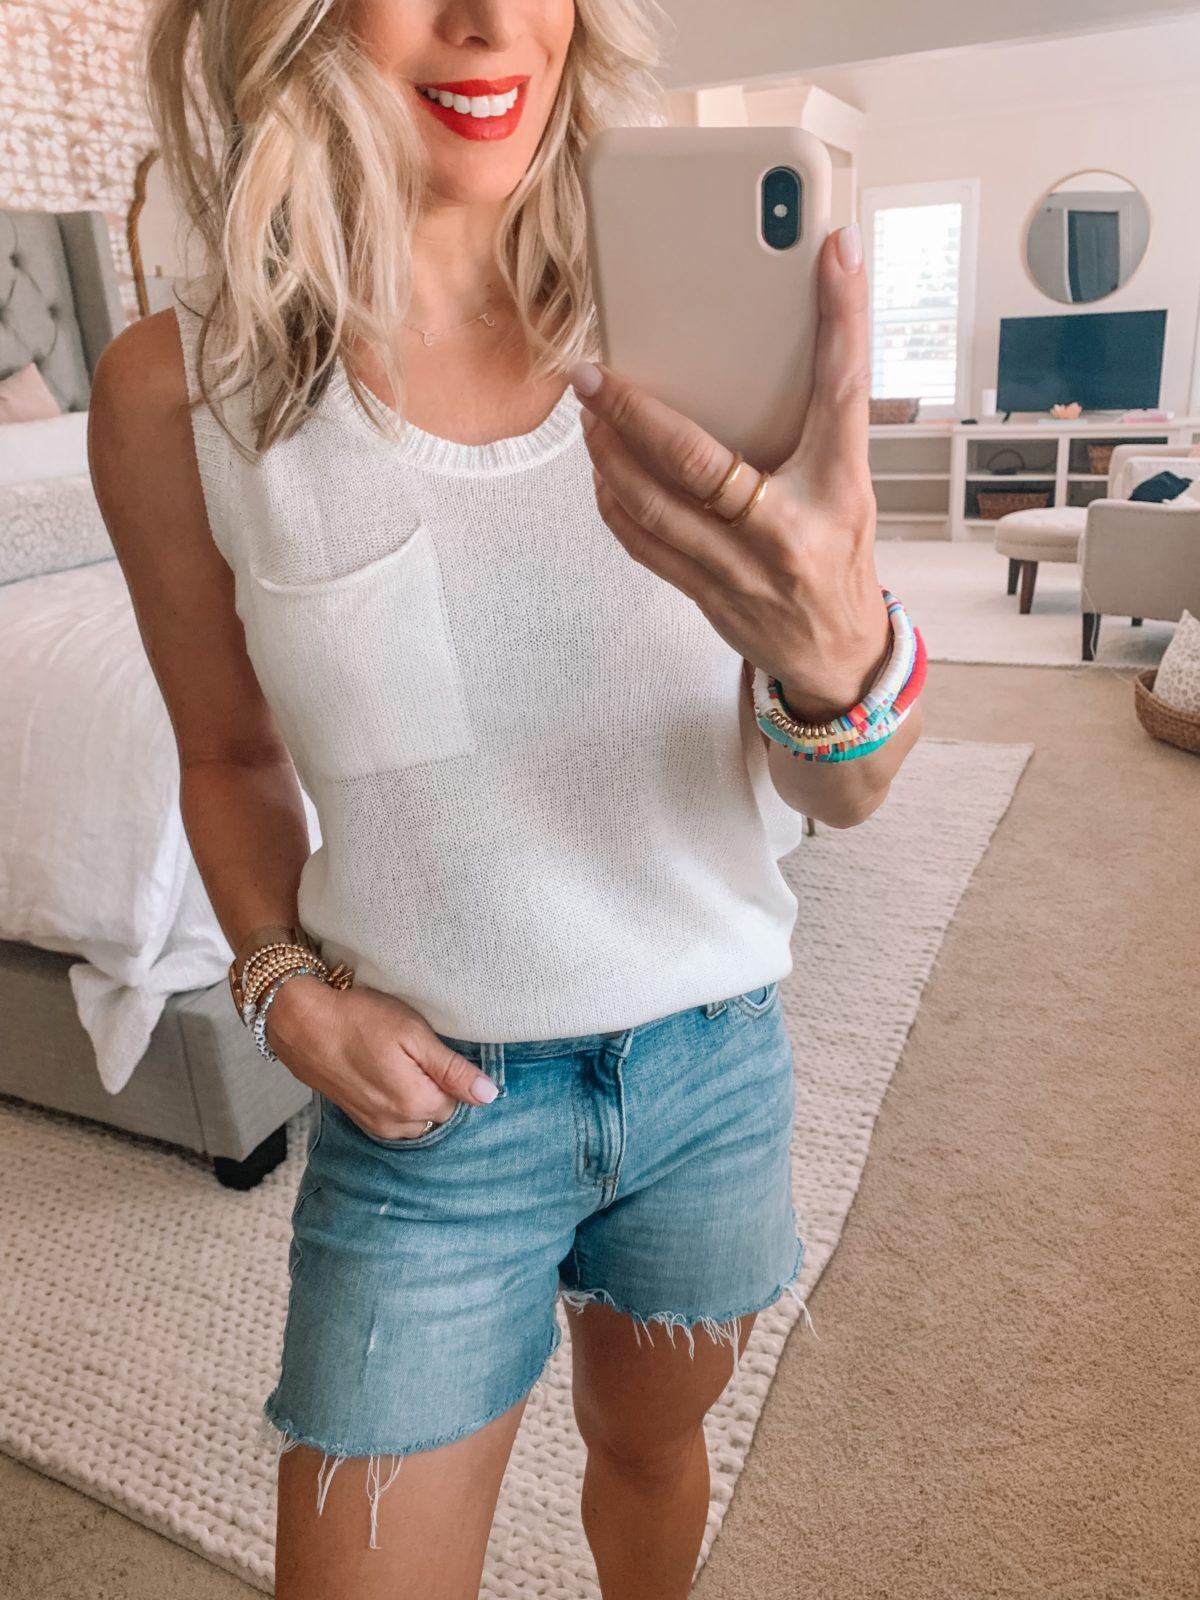 Amazon Fashion Finds, Sweater Pocket Tank, Denim Shorts, Rainbow Bracelets